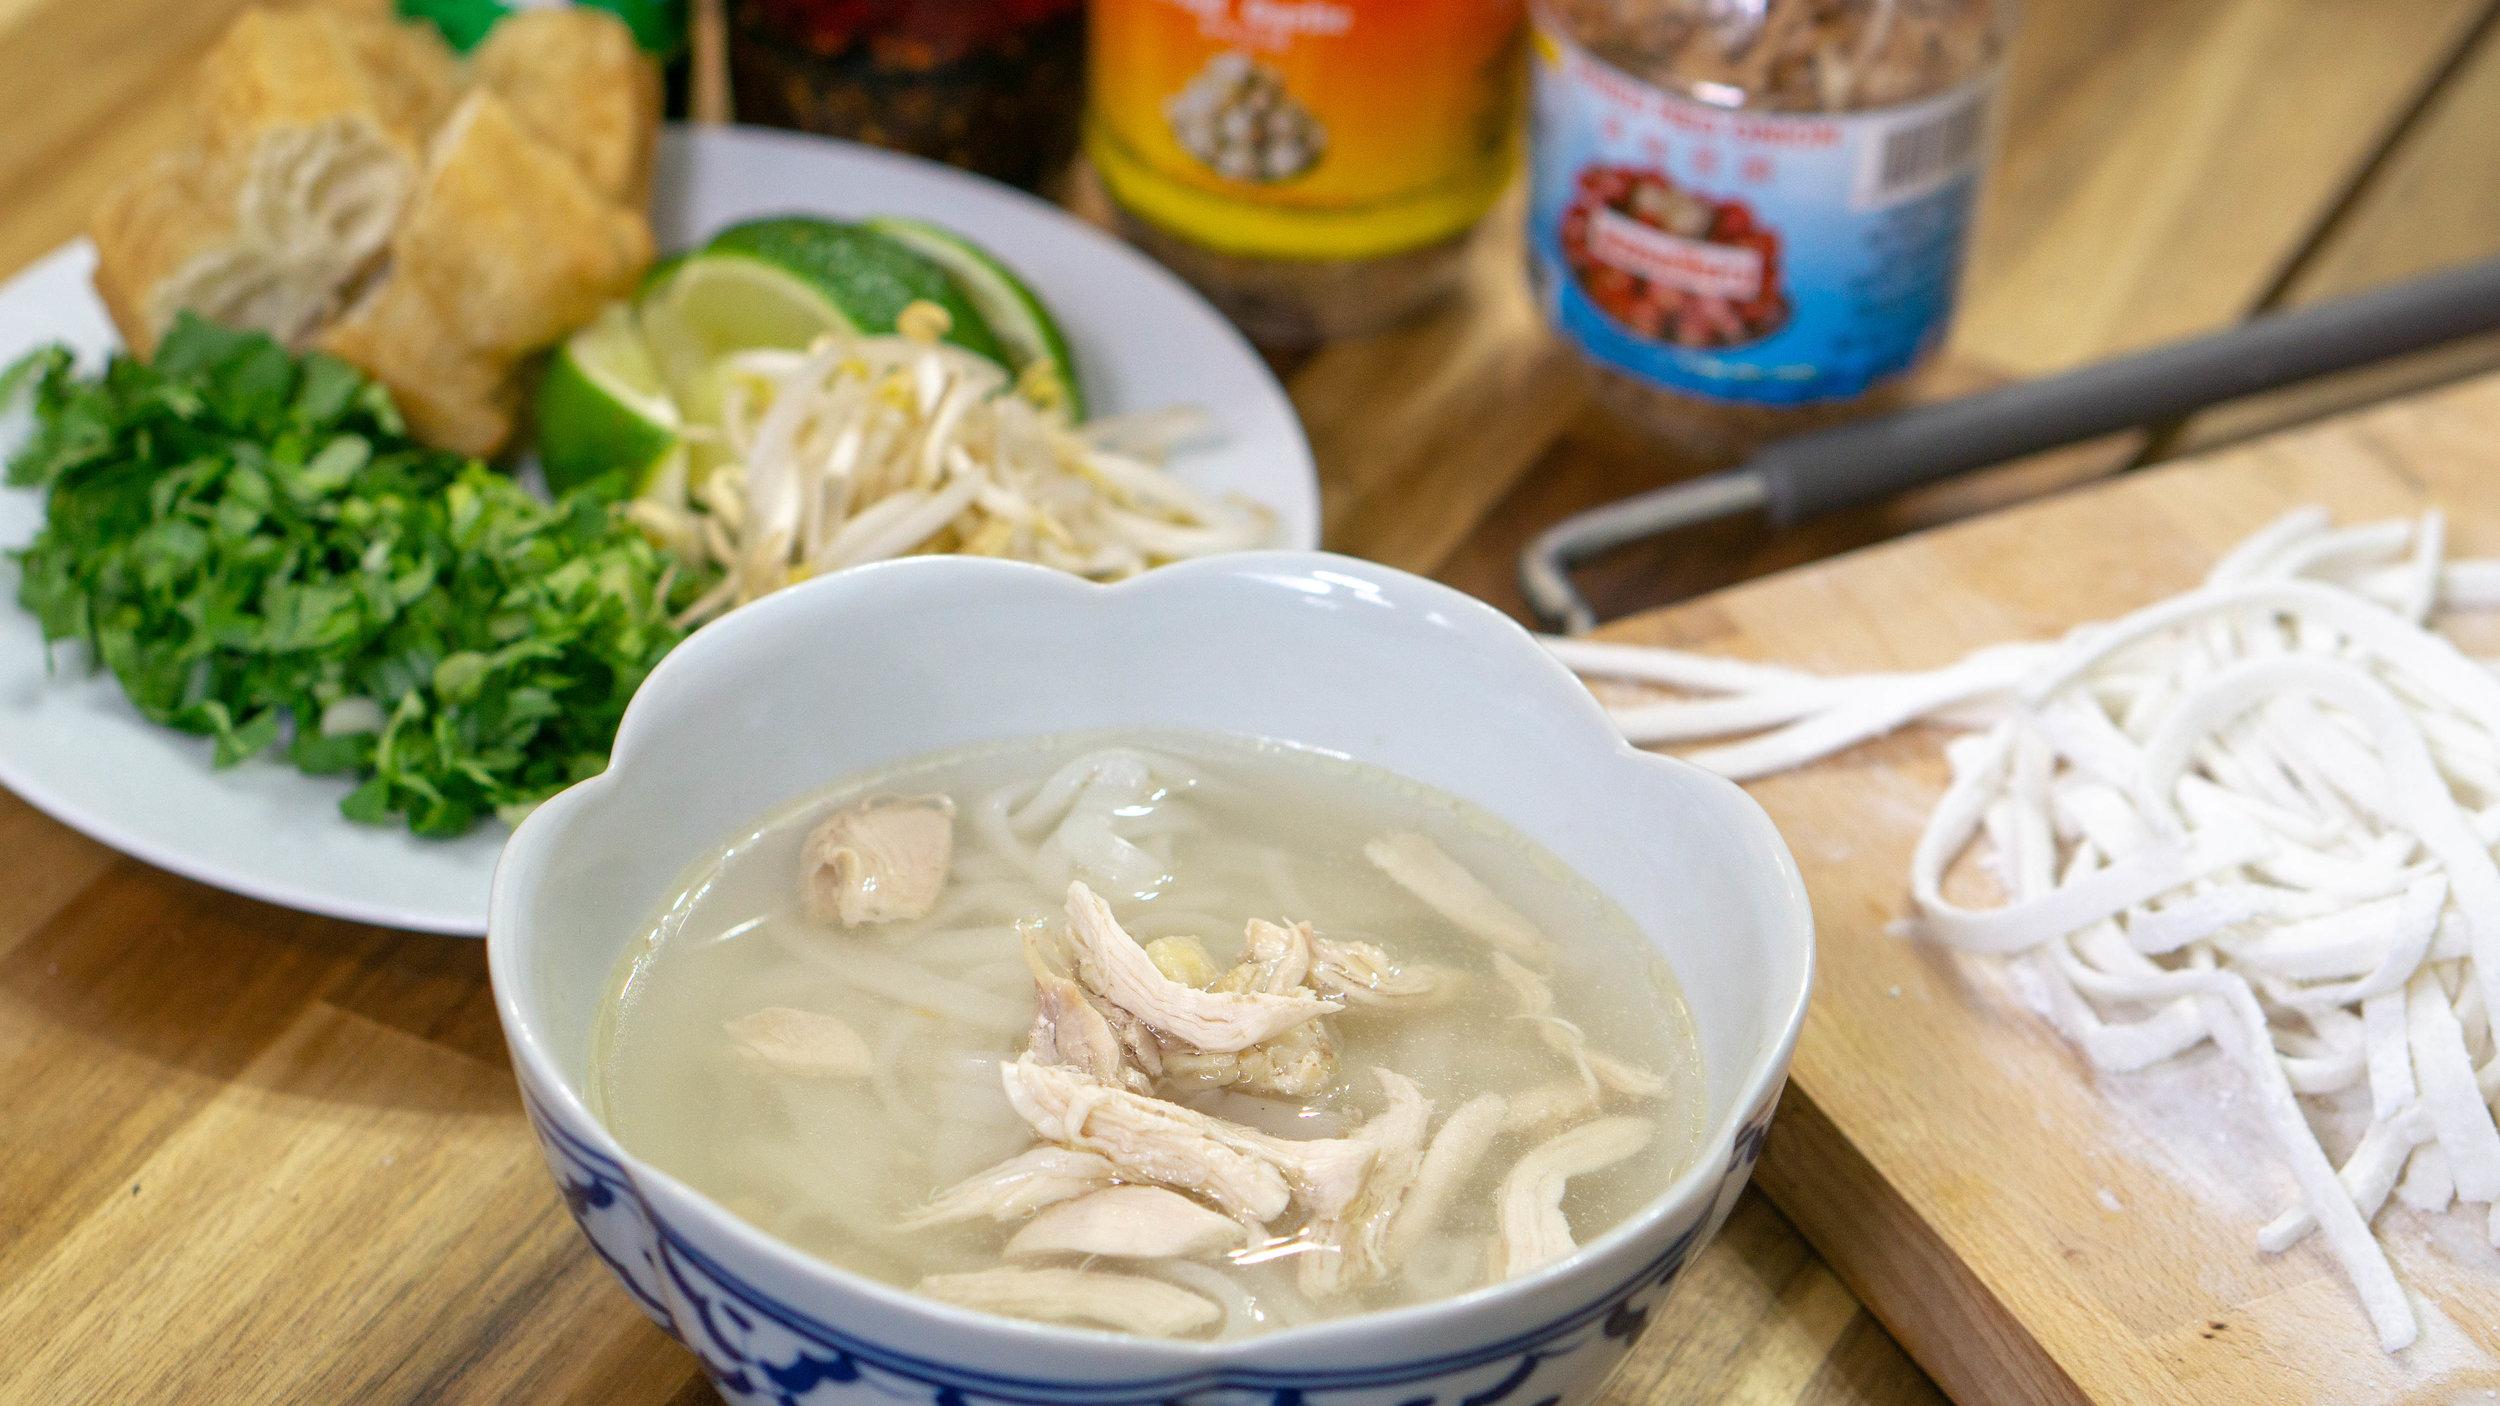 oodles_lao_noodles_KhaoPiekSen026.jpg